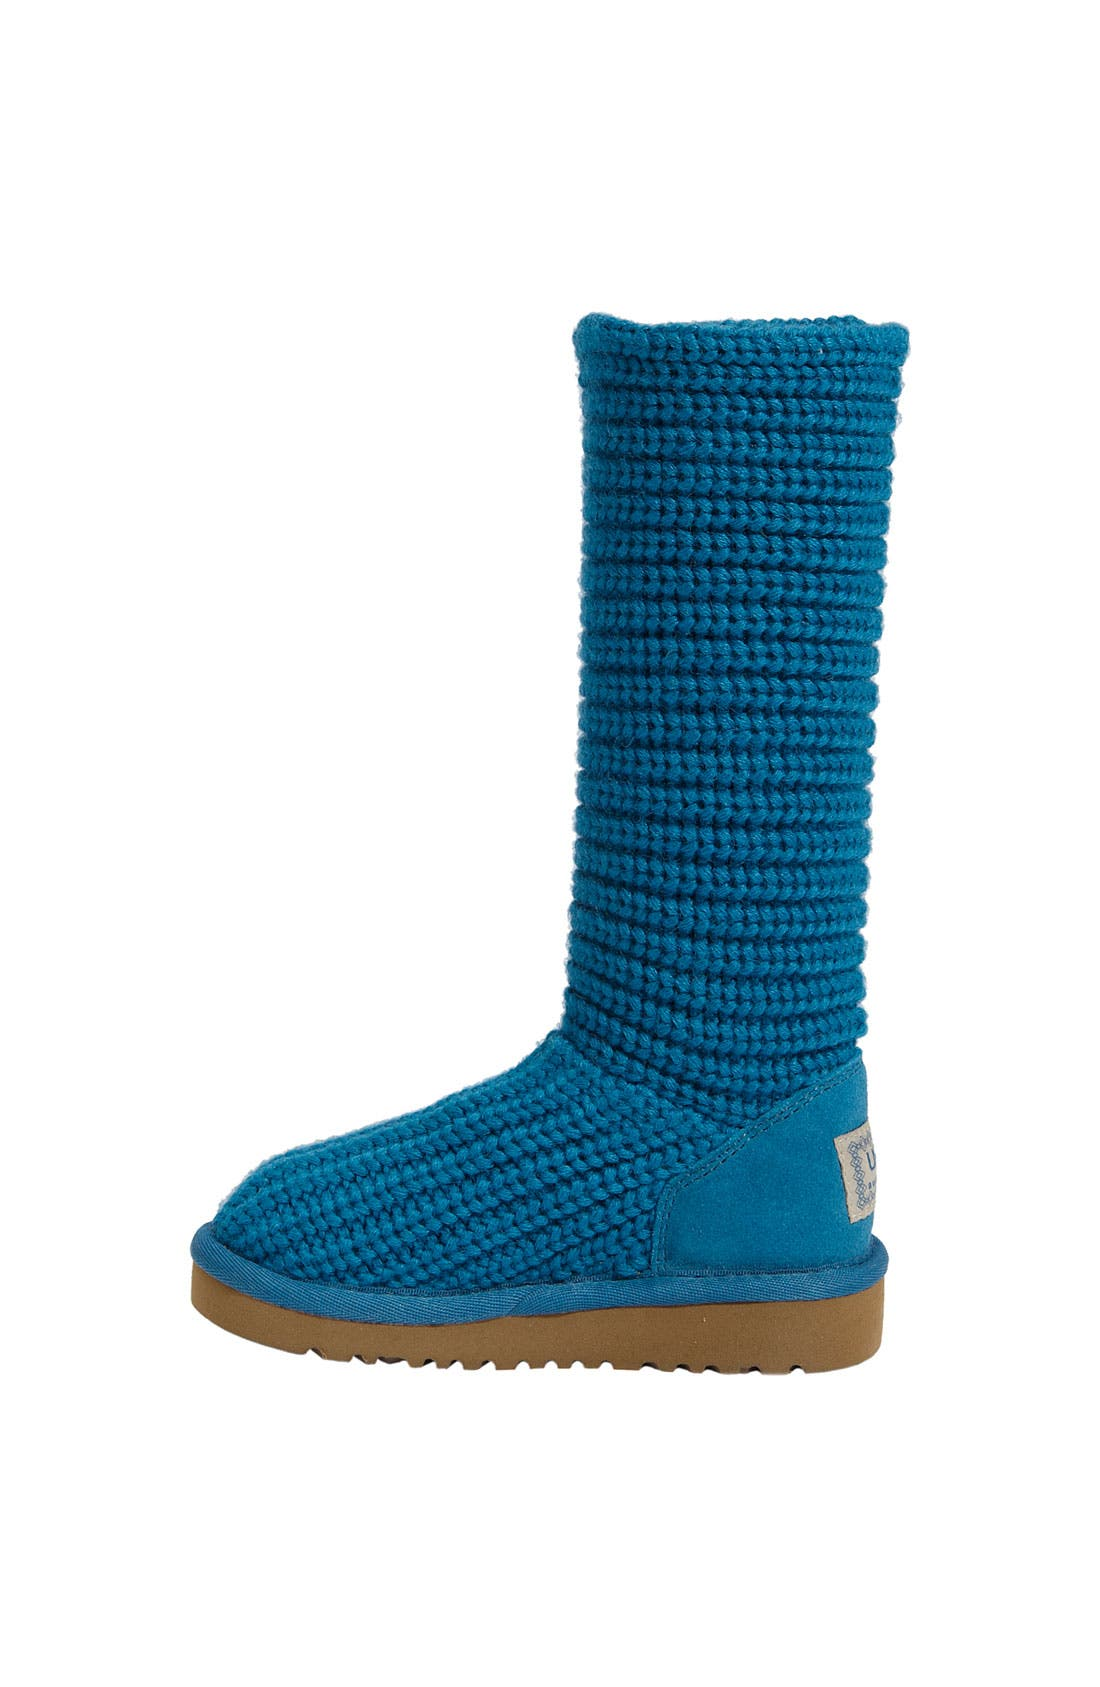 Alternate Image 2  - UGG® Australia 'Cardy II' Crochet Boot (Toddler, Little Kid & Big Kid)